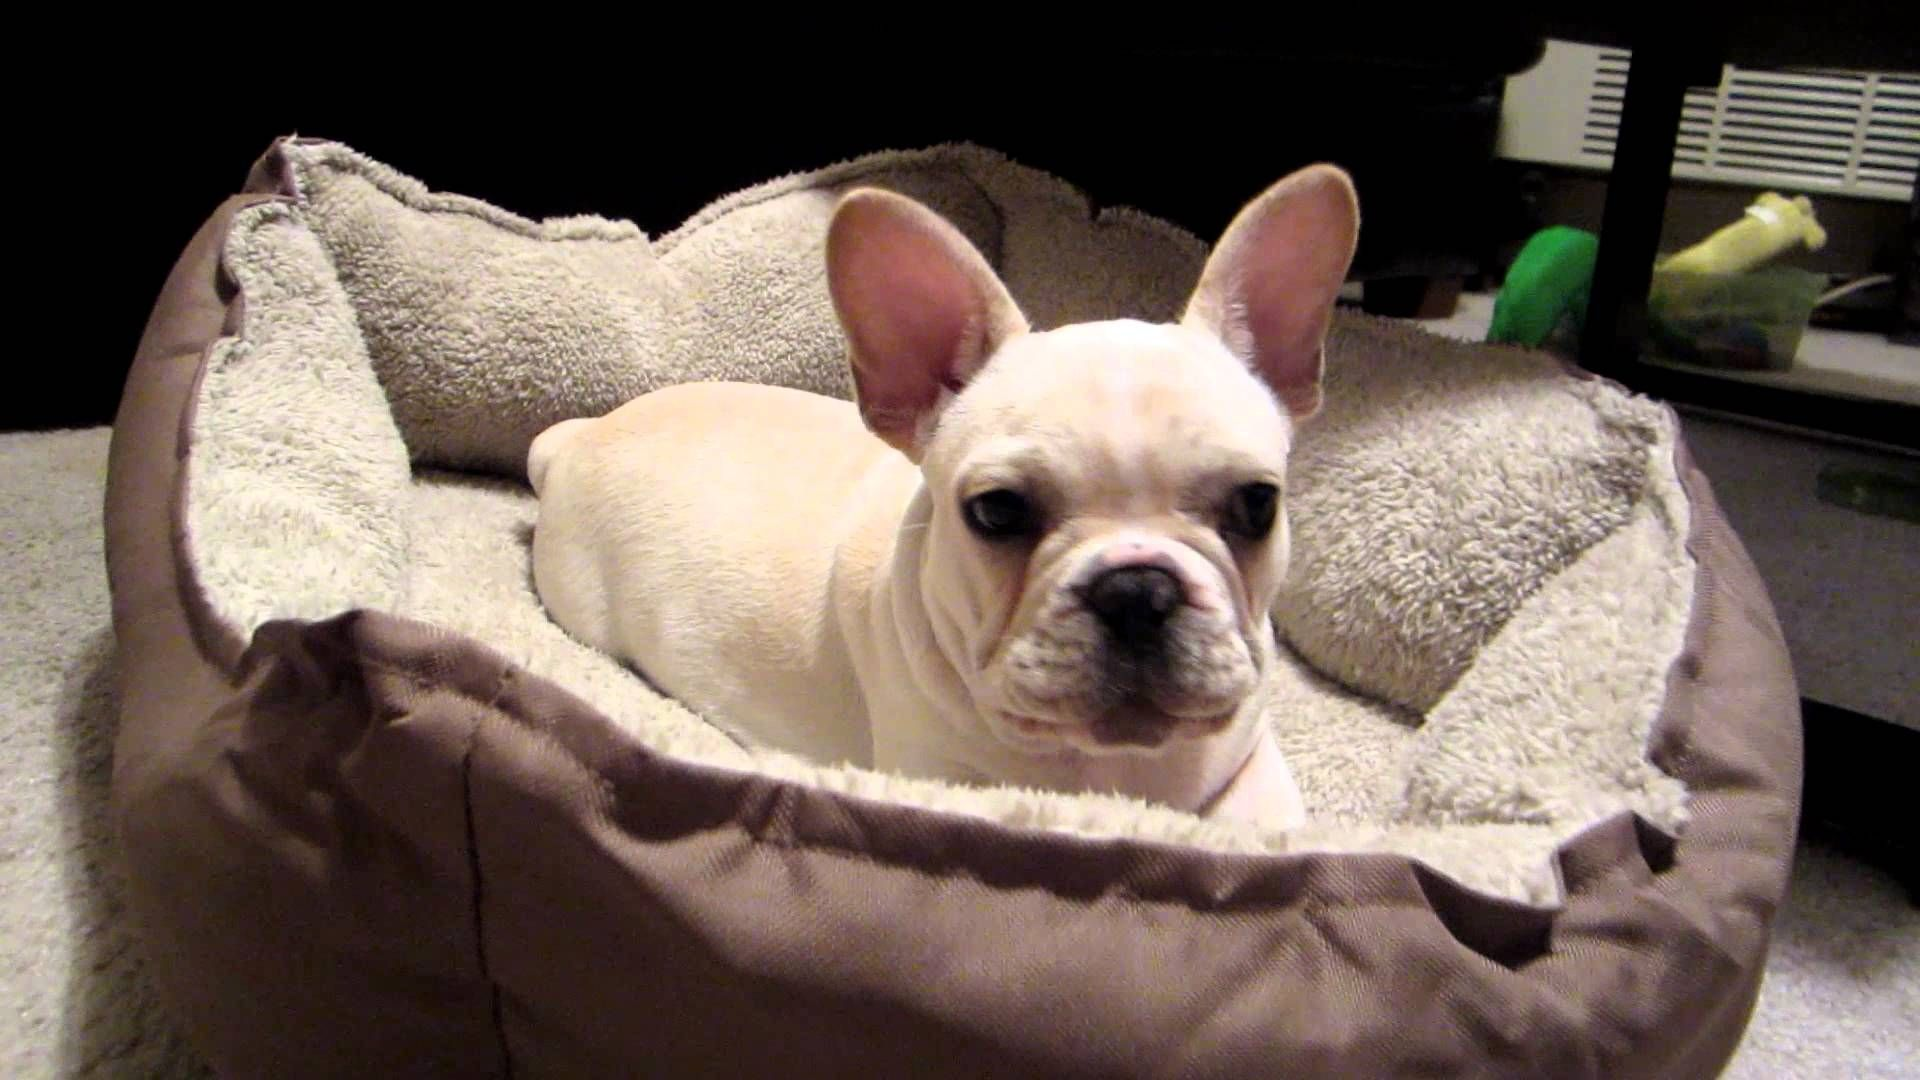 French Bulldog Puppy Angry When Woken Up French Bulldog Puppies